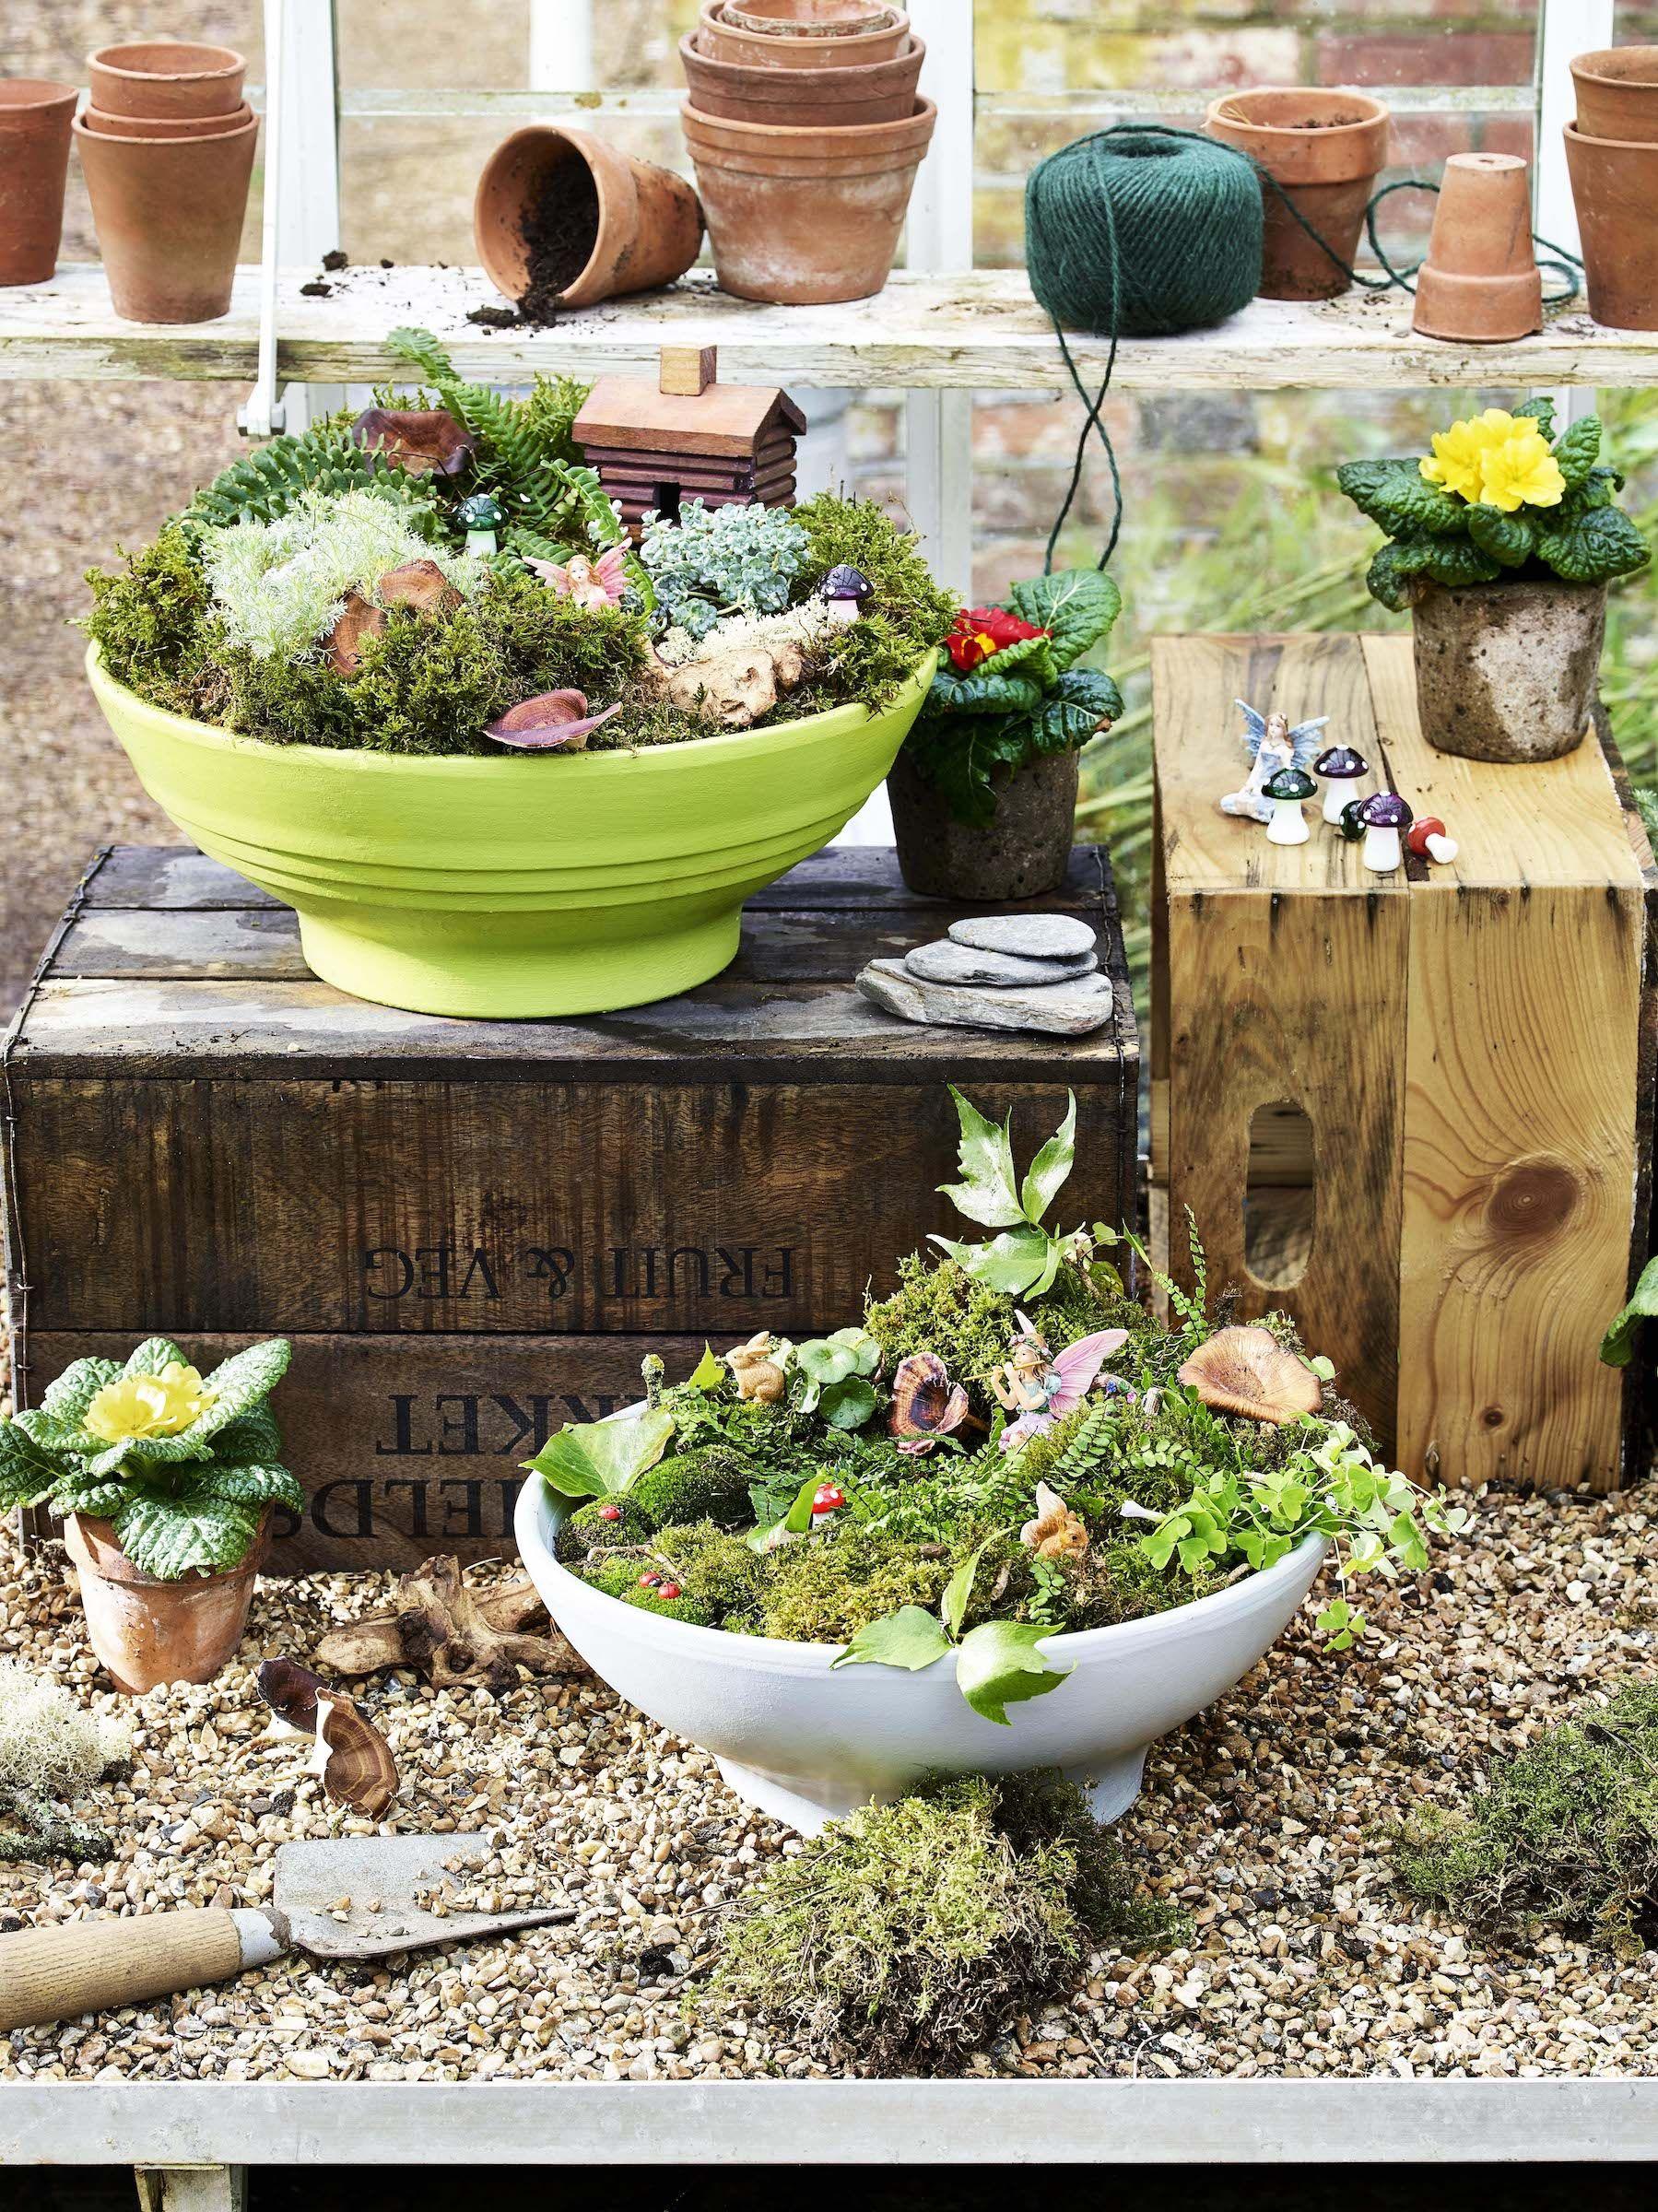 28 Creative DIY Garden Ideas: Step By Step